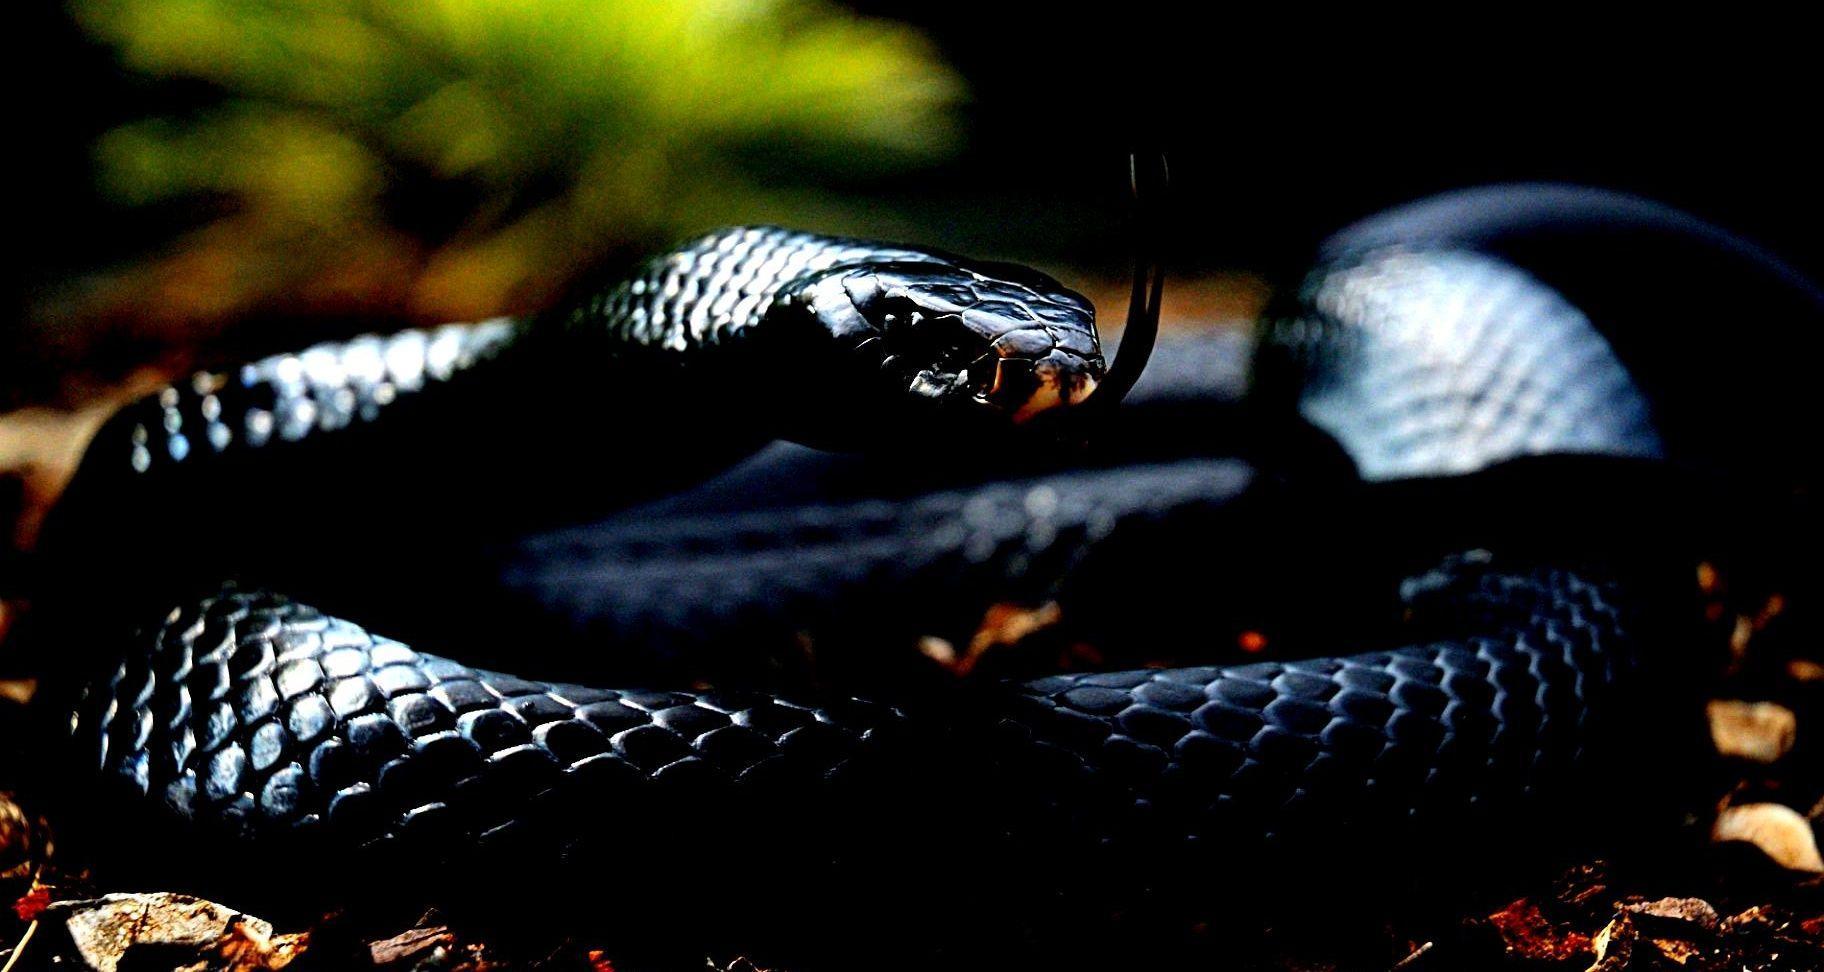 Hd Wallpaper Of Black Snake: Black Mamba Wallpapers